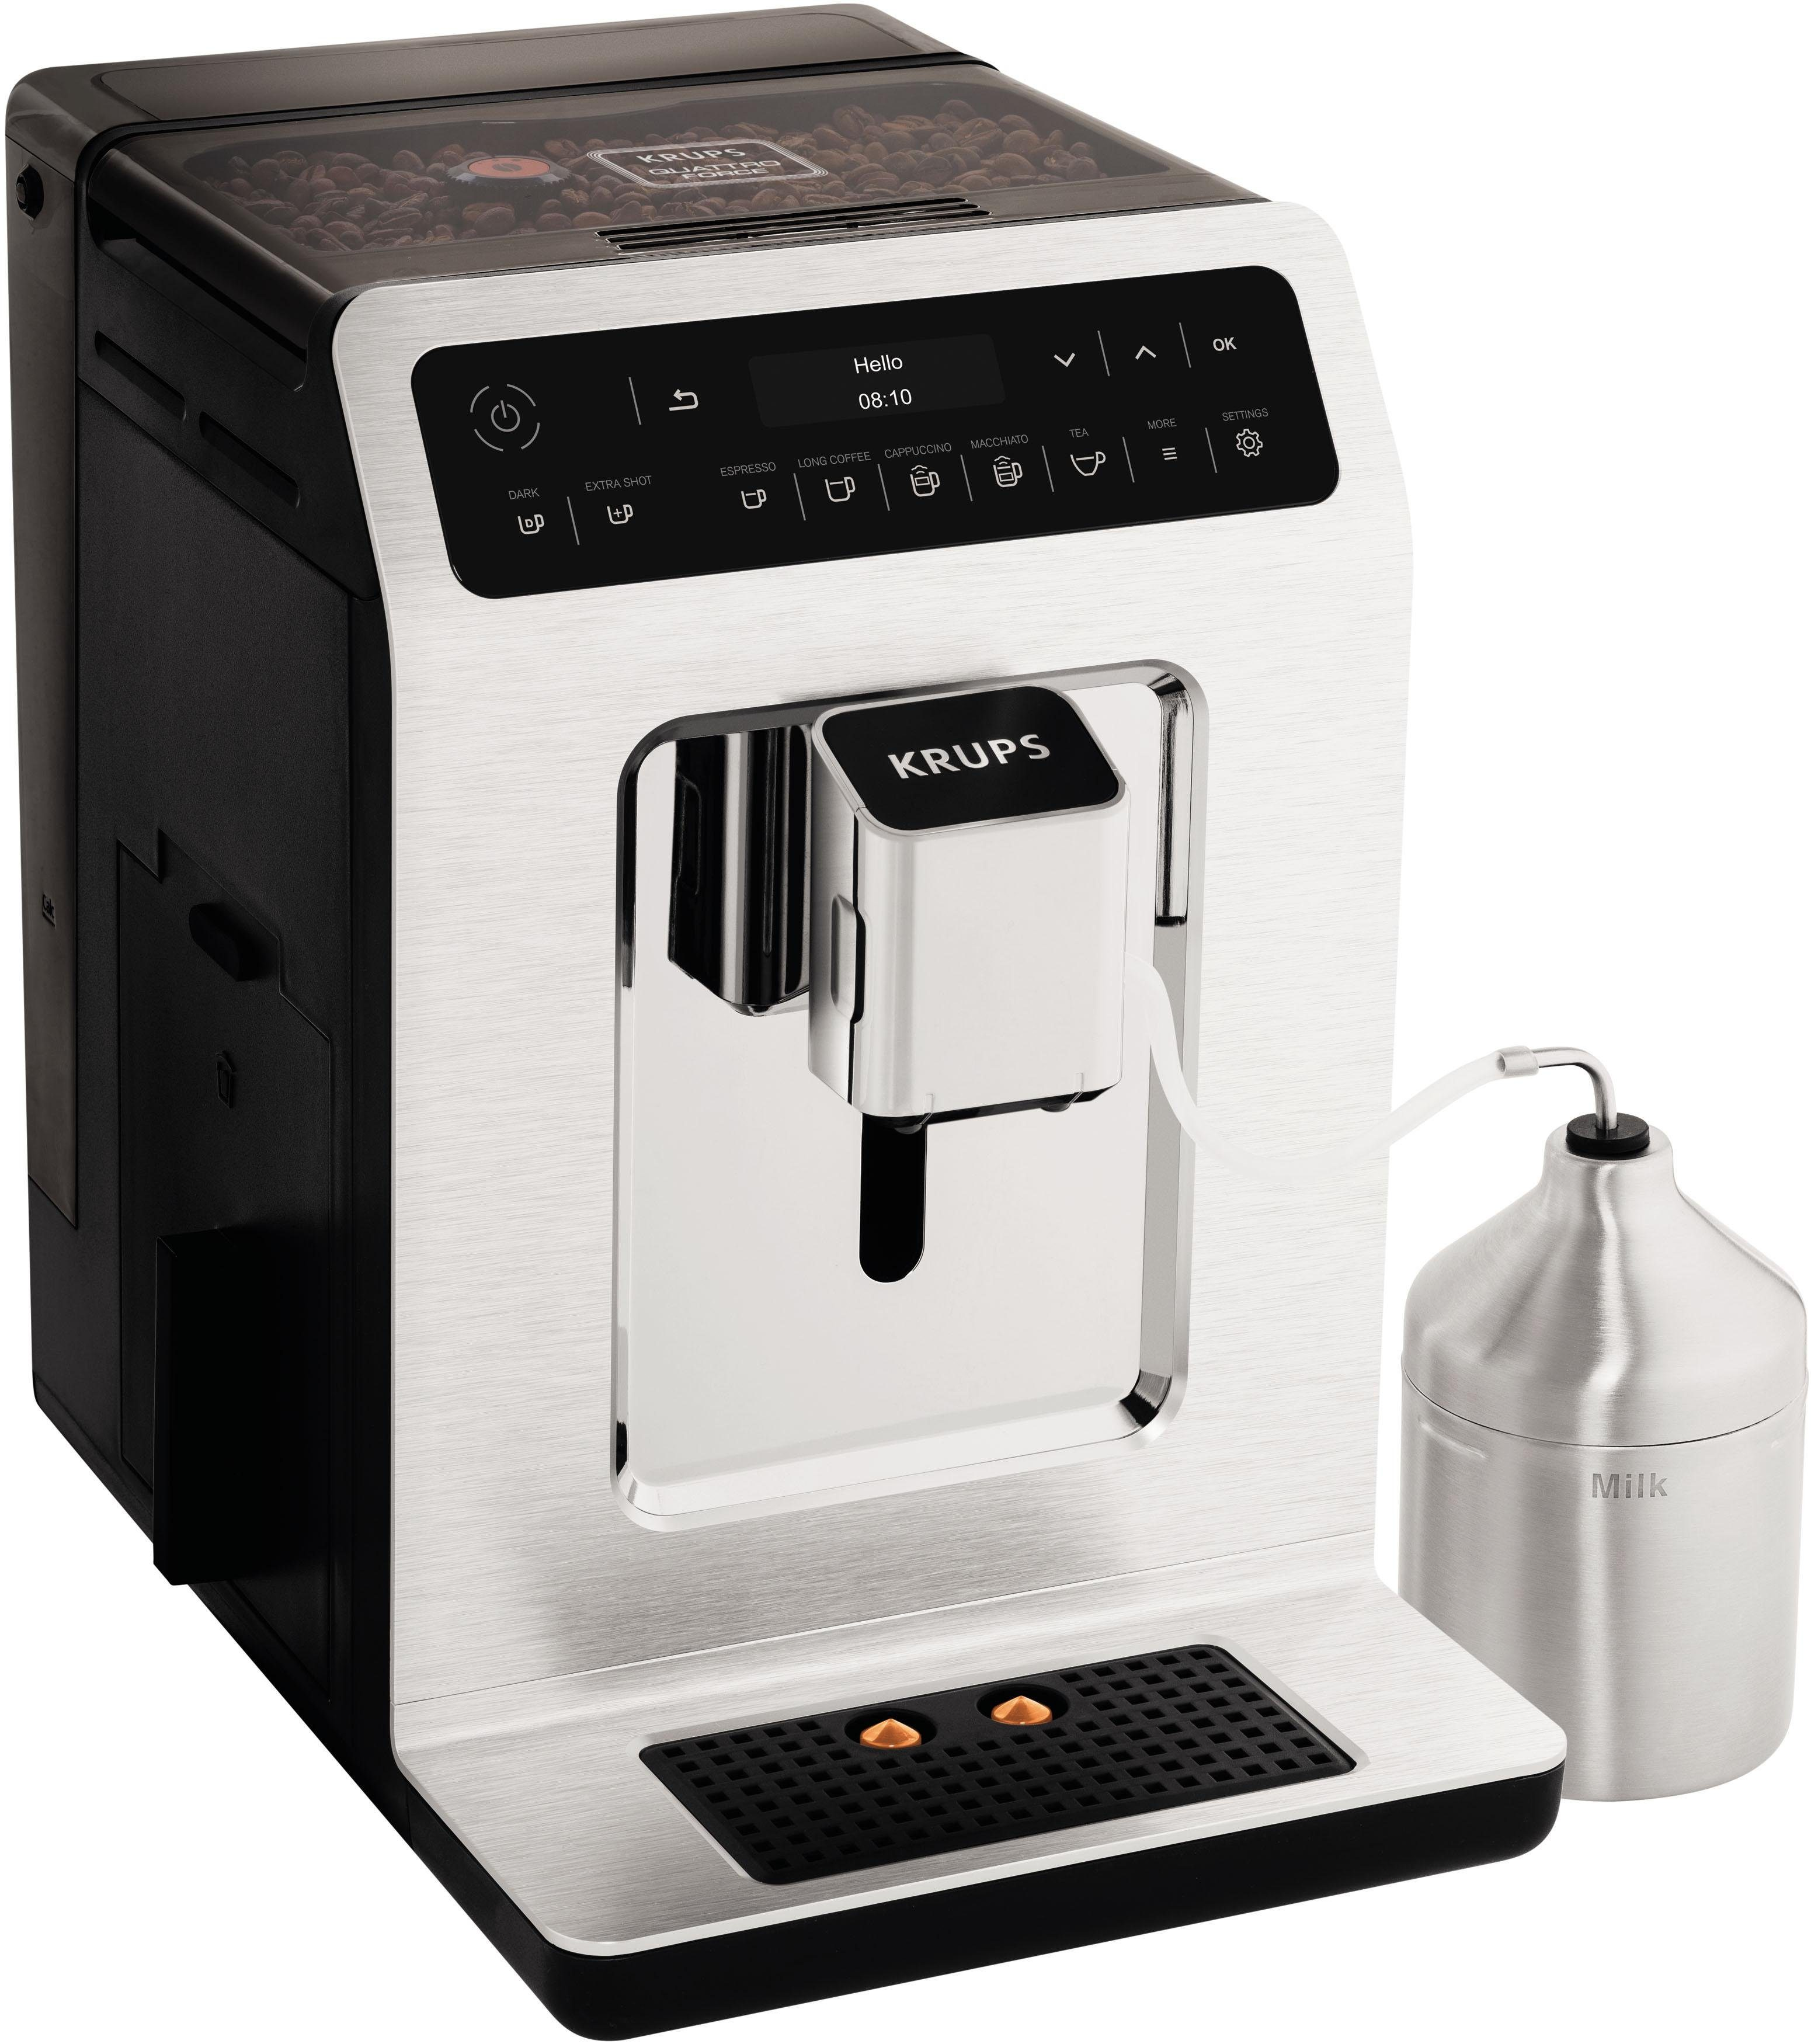 Krups Kaffeevollautomat EA891C Evidence Chrome Espresso-Vollautomat, 2,1l Tank, Kegelmahlwerk, mit 15 Voreinstellungen